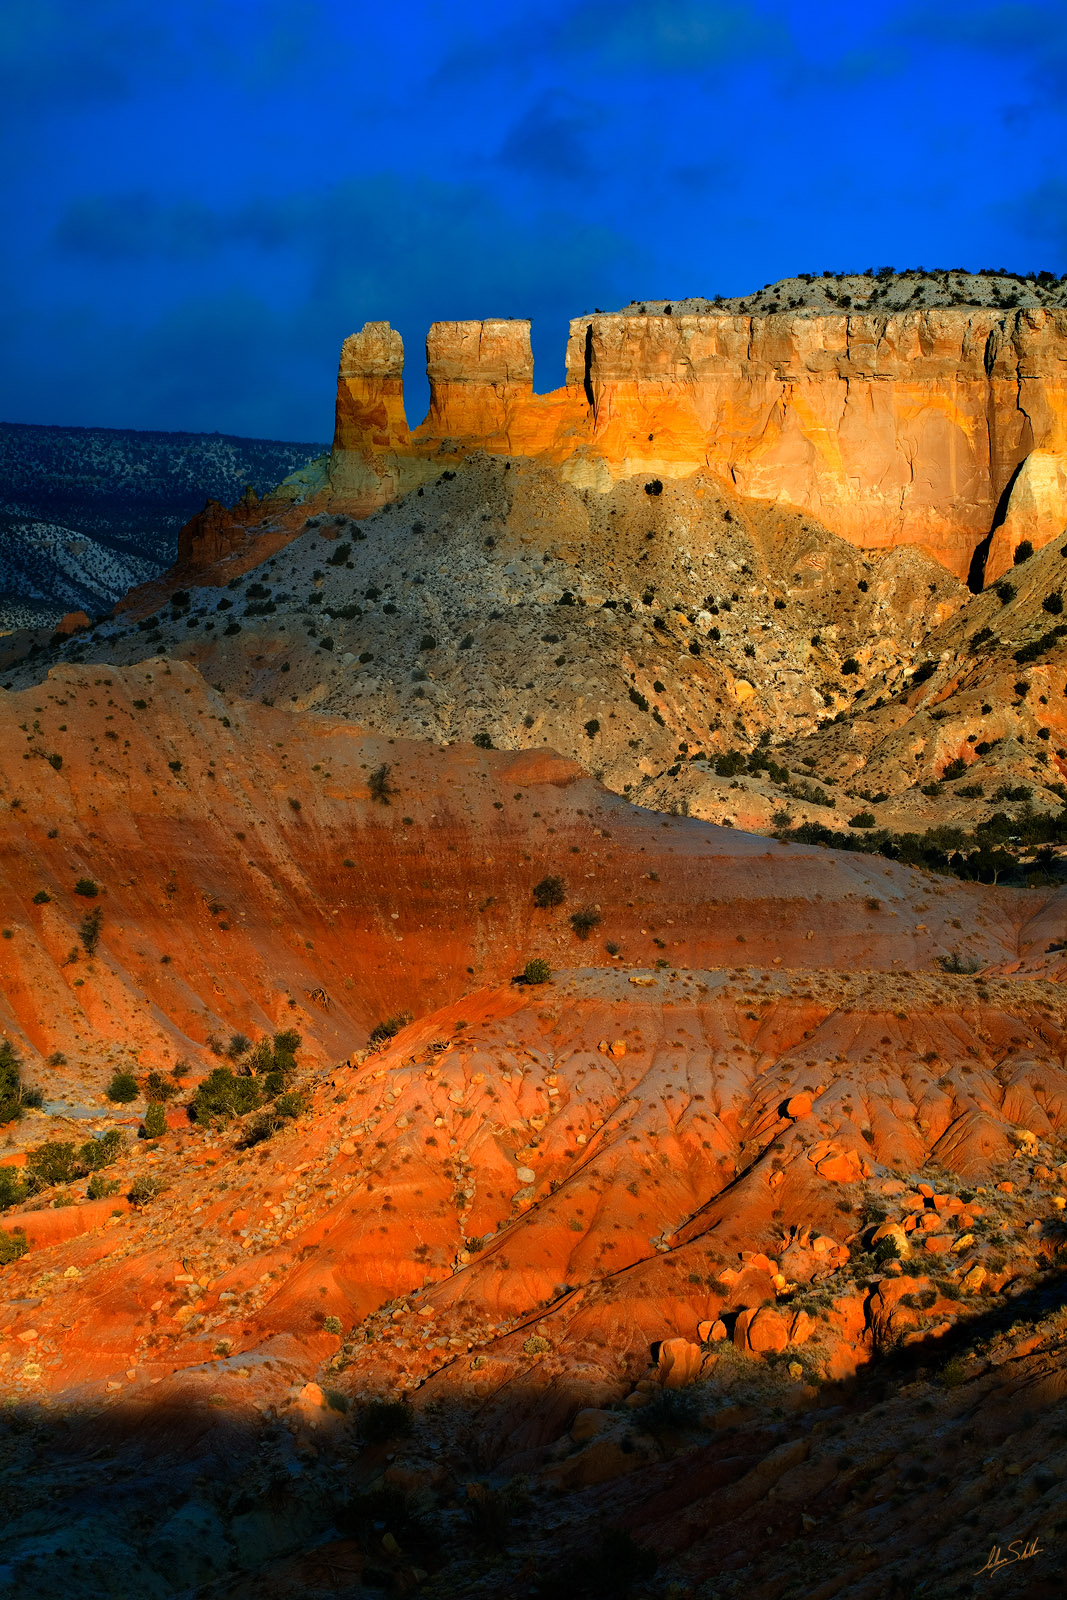 abiquiu, desert, ghost ranch, new mexico, nm, southwest, southwestern, okeeffe, georgia okeeffe, photo